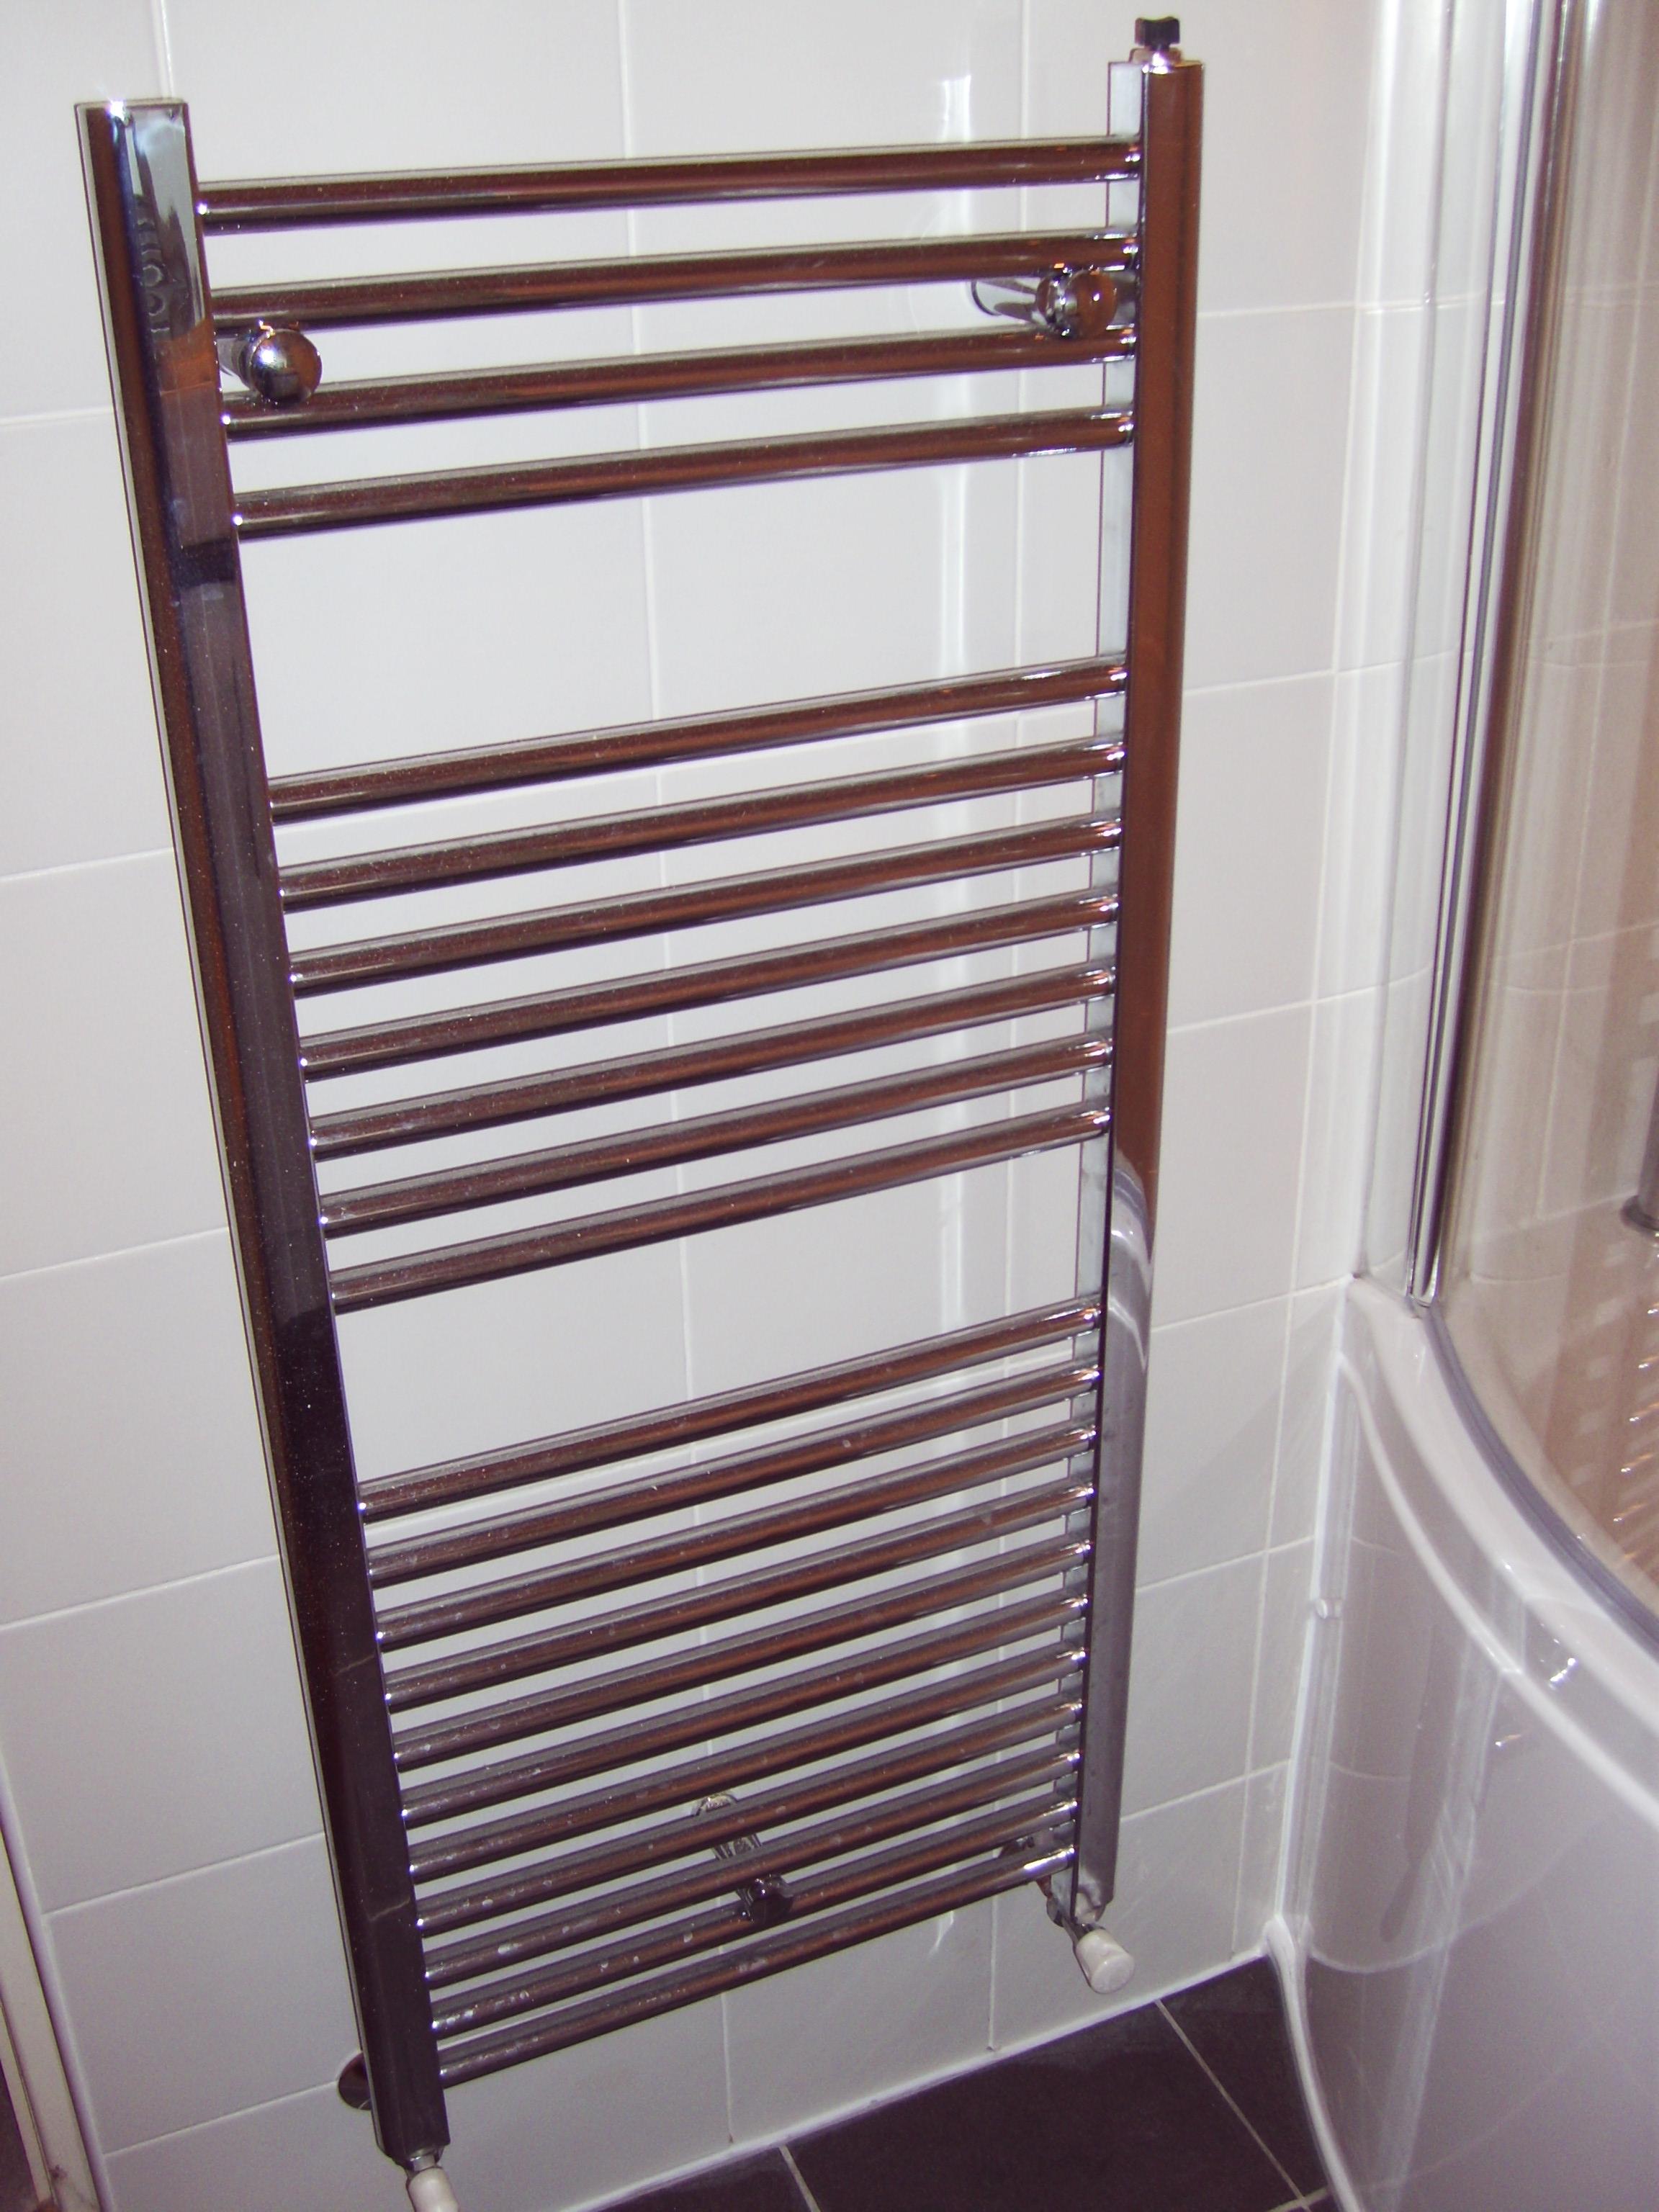 Towel Rail & Radiators